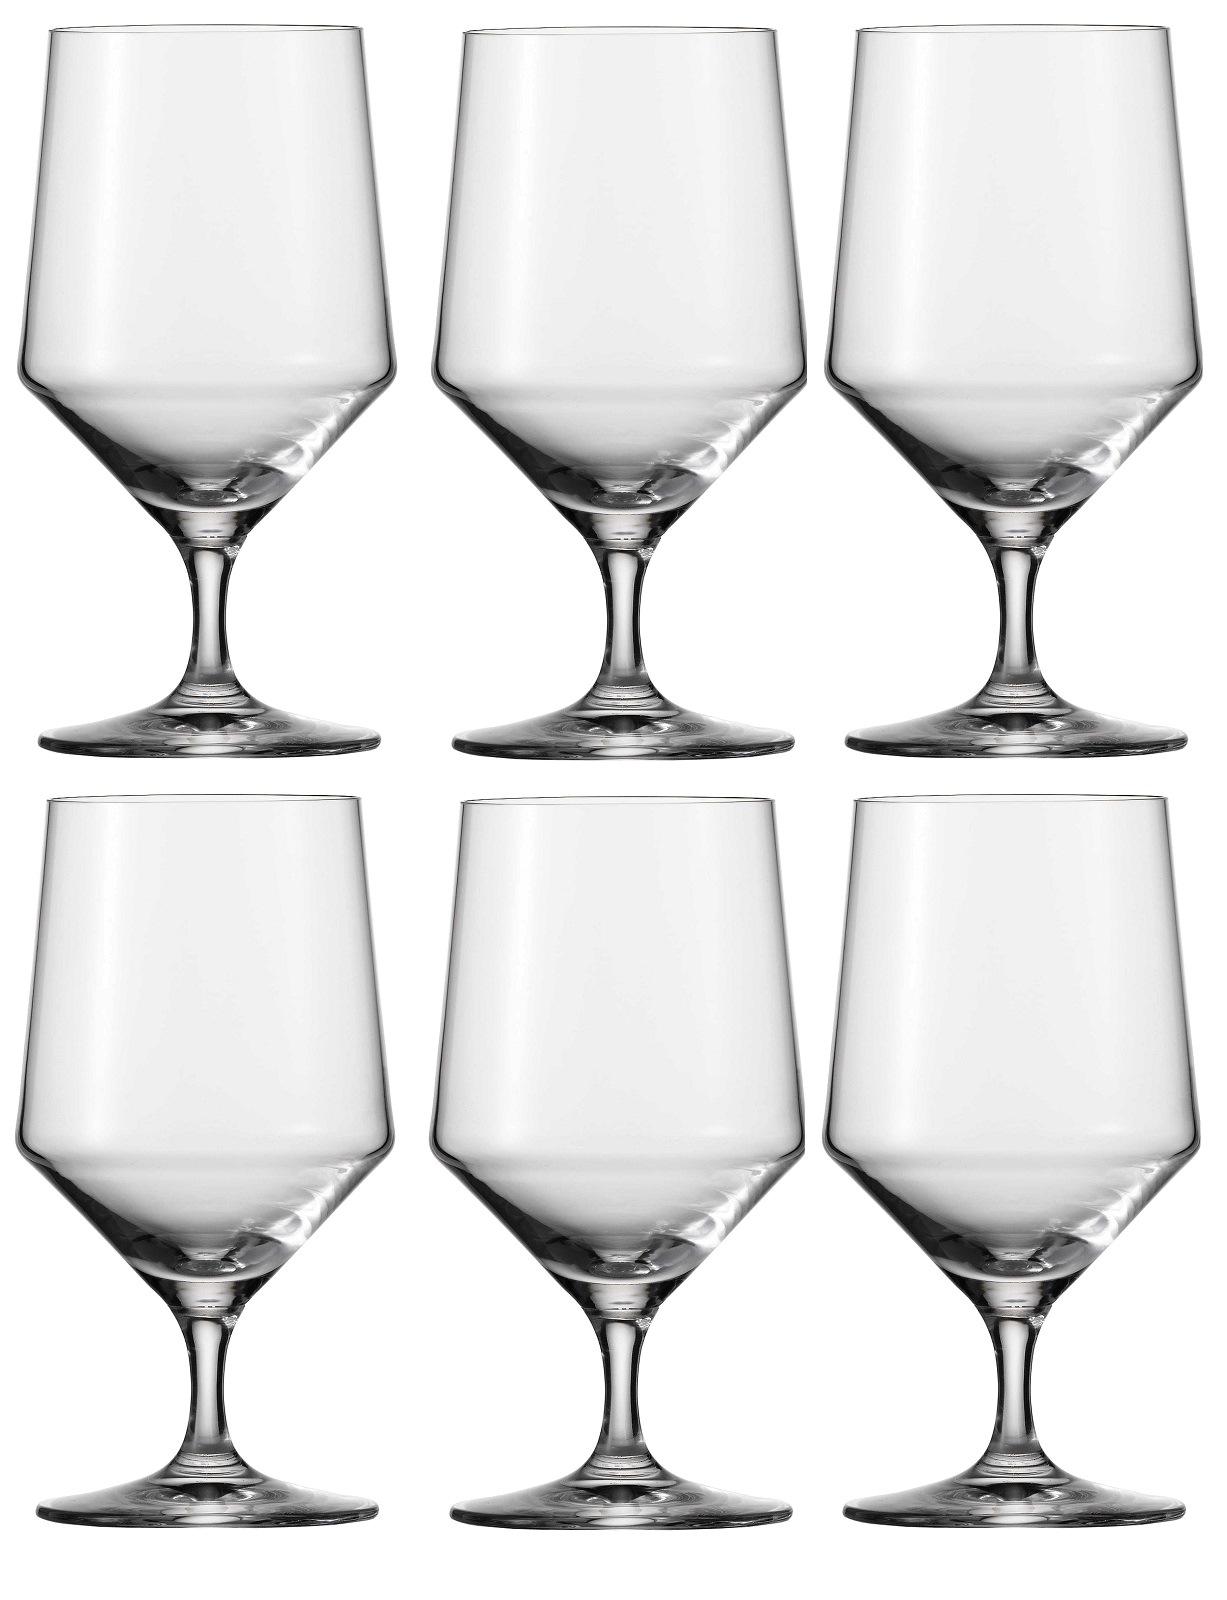 Набор бокалов для воды Schott Zwiesel PURE, объем 0,451 л, прозрачный,  6 штук Schott Zwiesel 112842_6шт фото 0